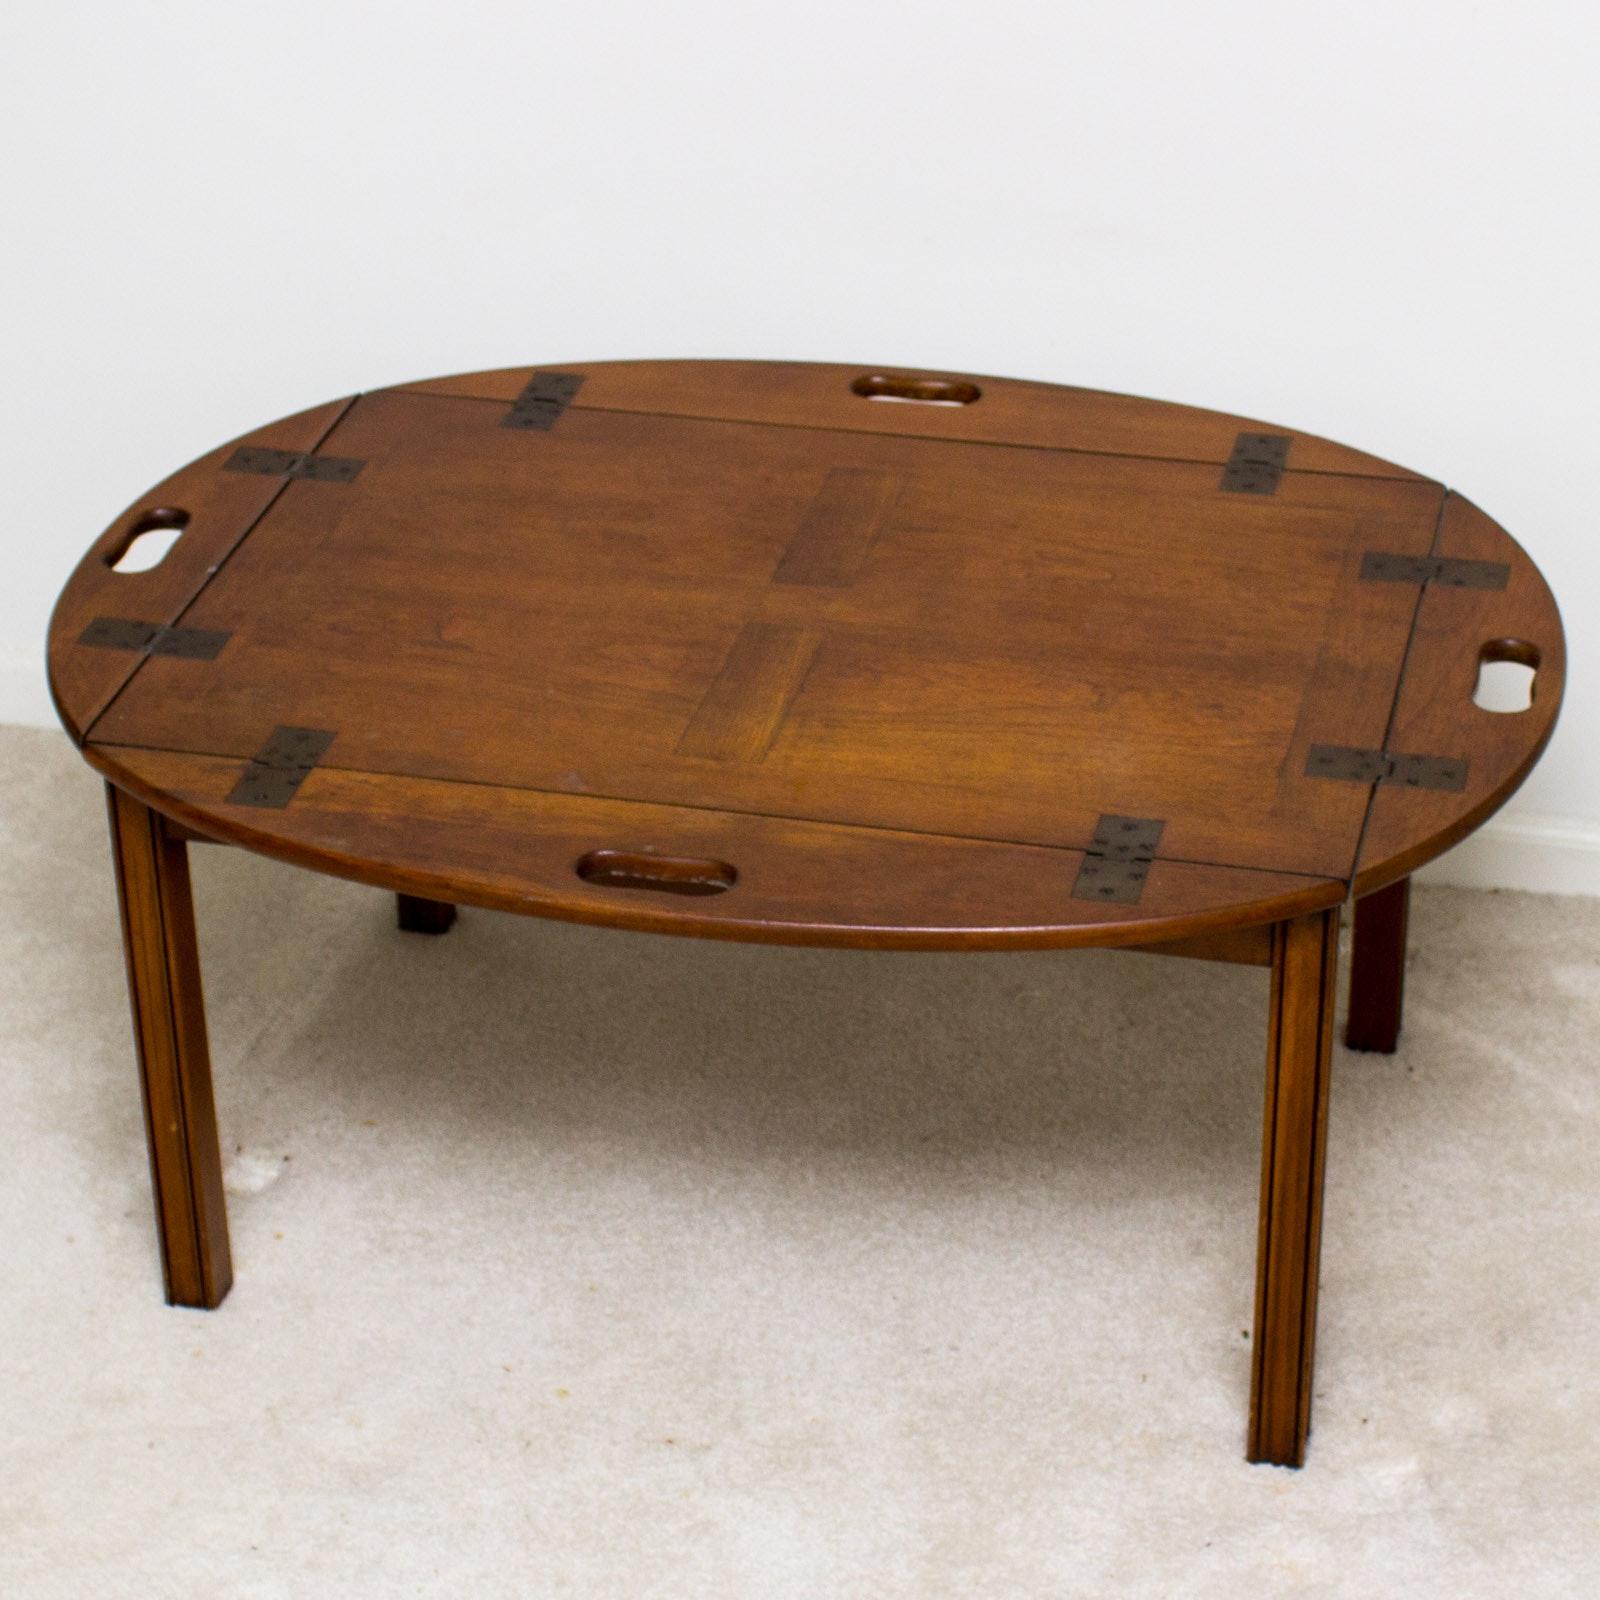 Vintage Walnut Butleru0027s Tray Coffee Table ...